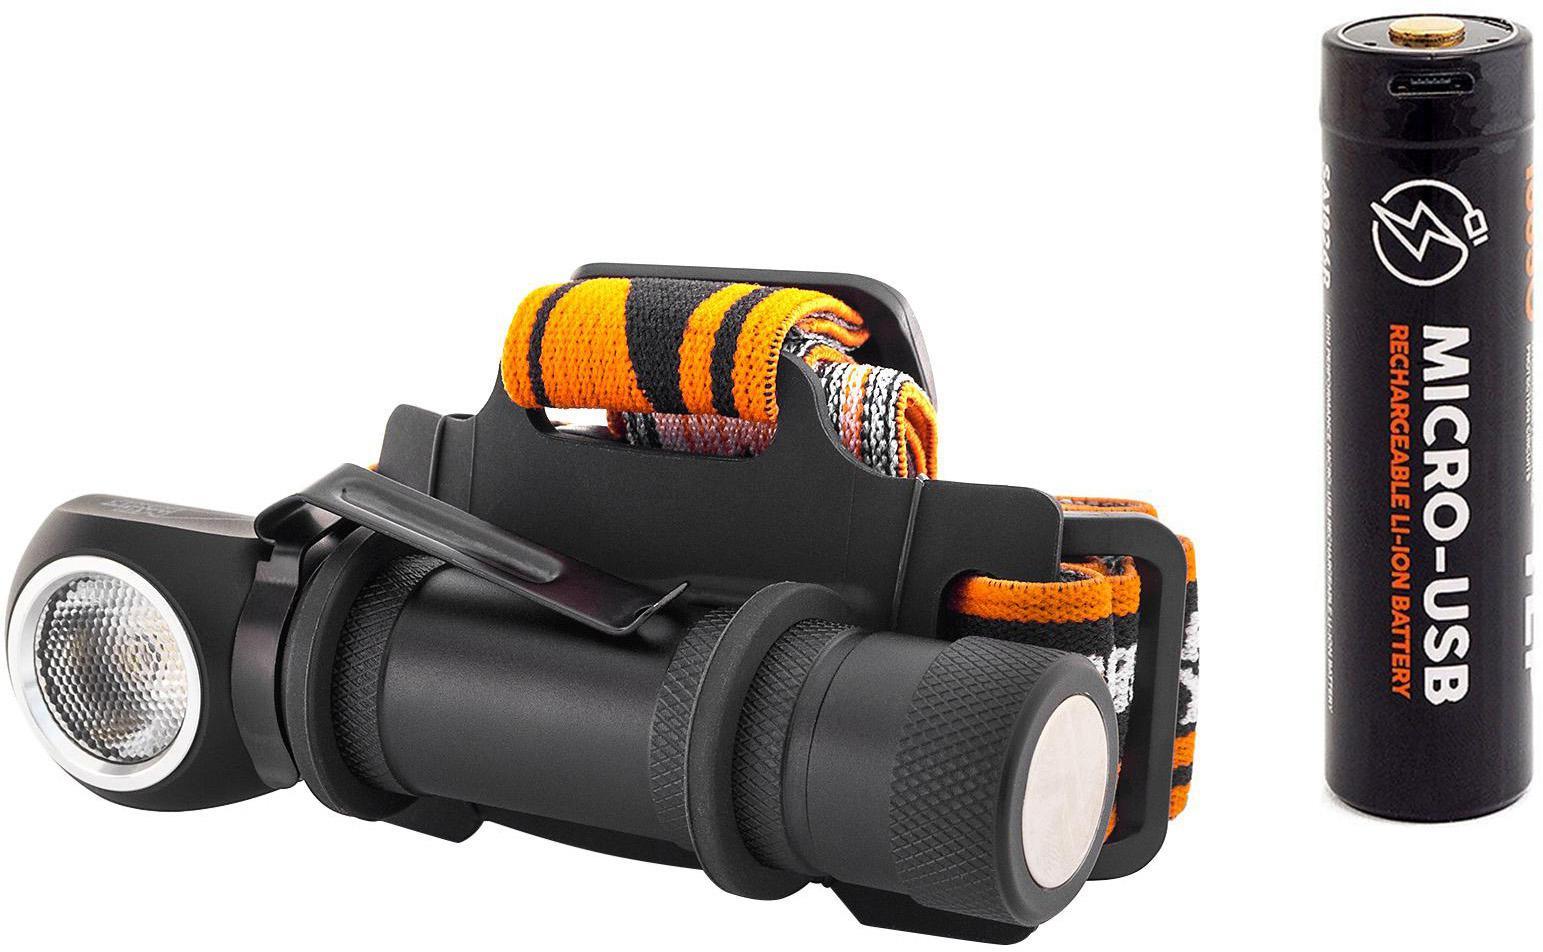 Набор ЯРКИЙ ЛУЧ Фонарь lh-500 accu enot +Аккумулятор ylp sa1826 аккумулятор яркий луч lg1833r 18650 li ion 3350mah 1шт блистер